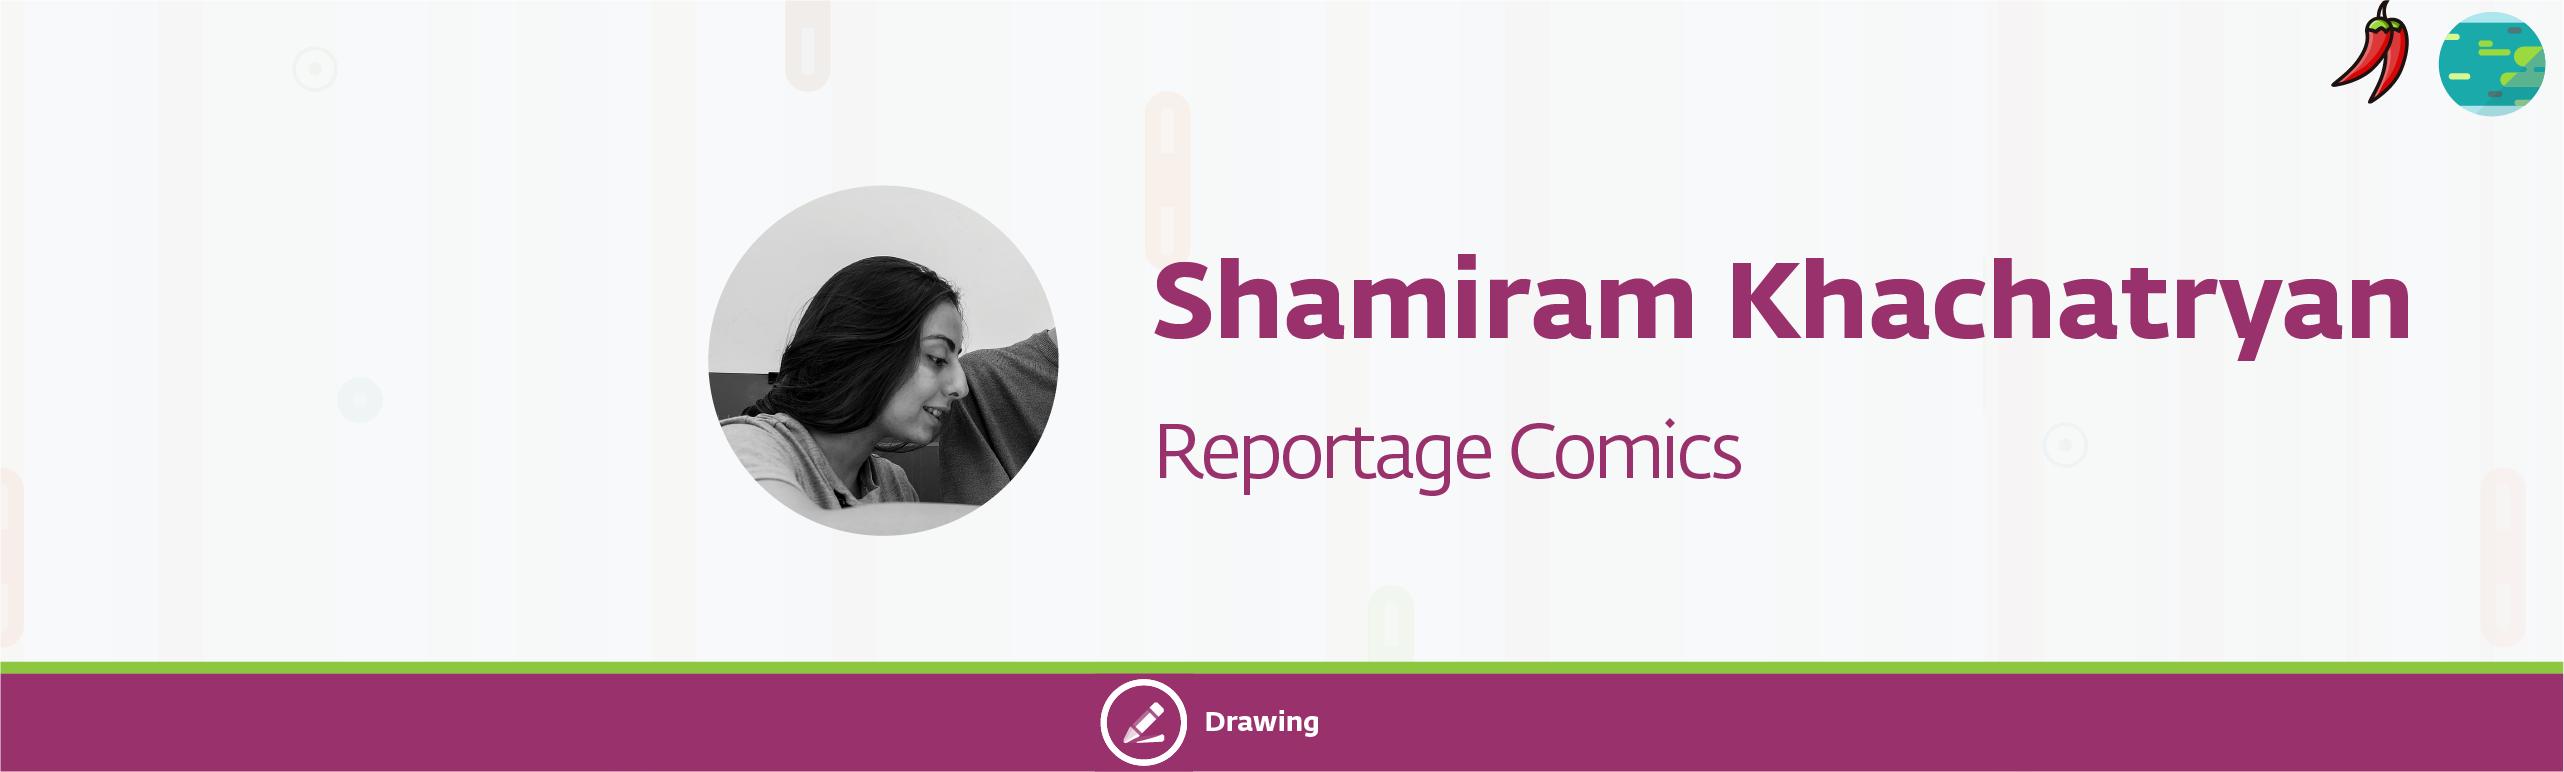 shamiram b 29 - Reportage Comics